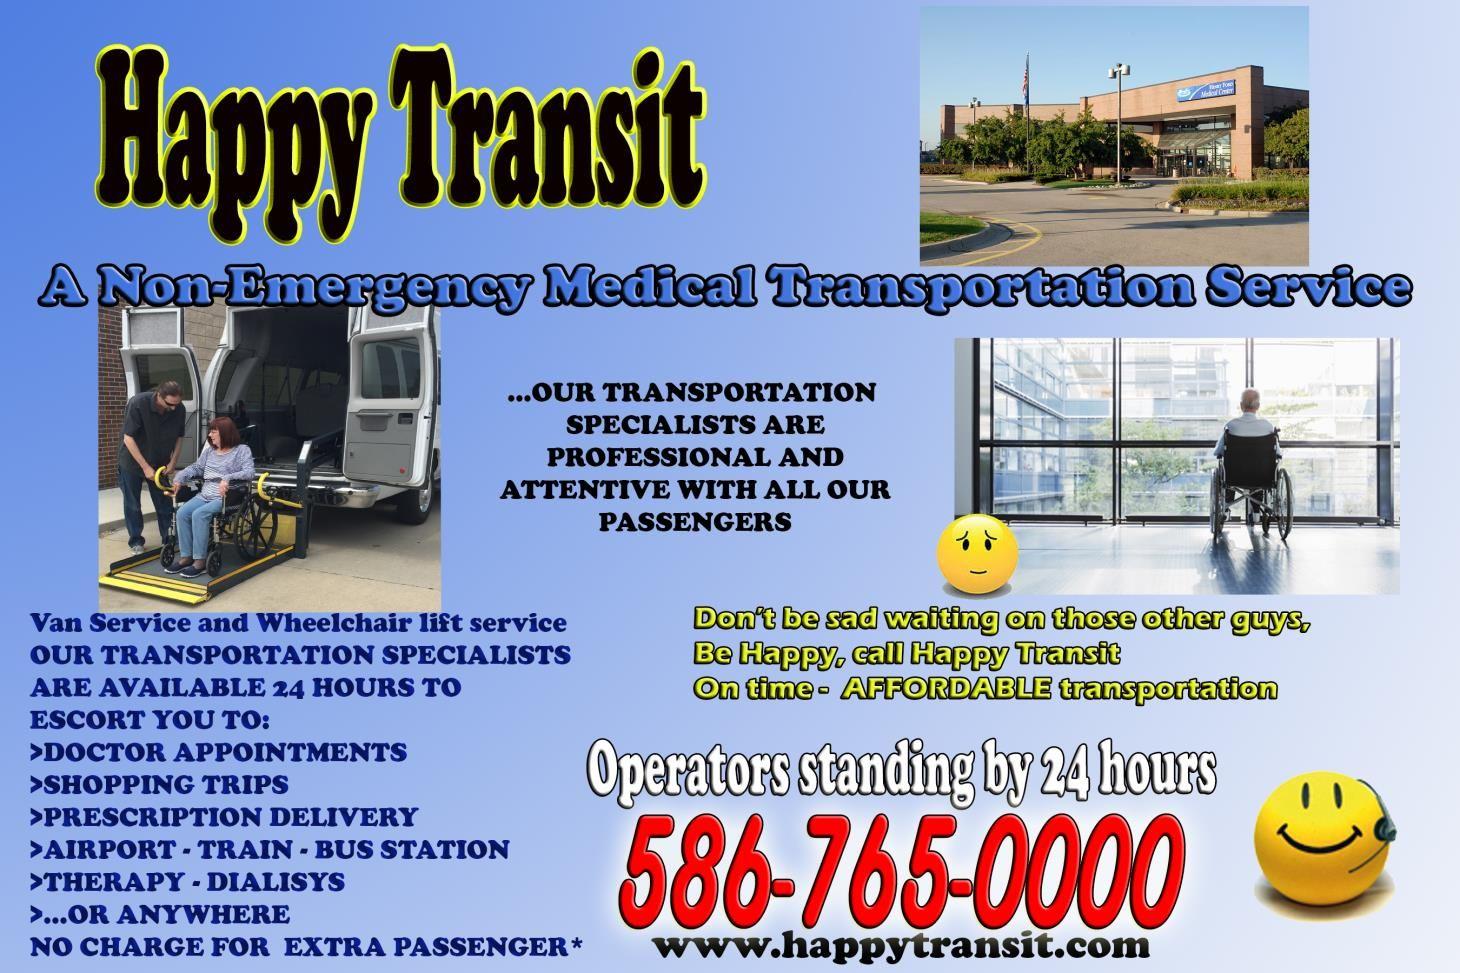 Happy Transit Service Image 3